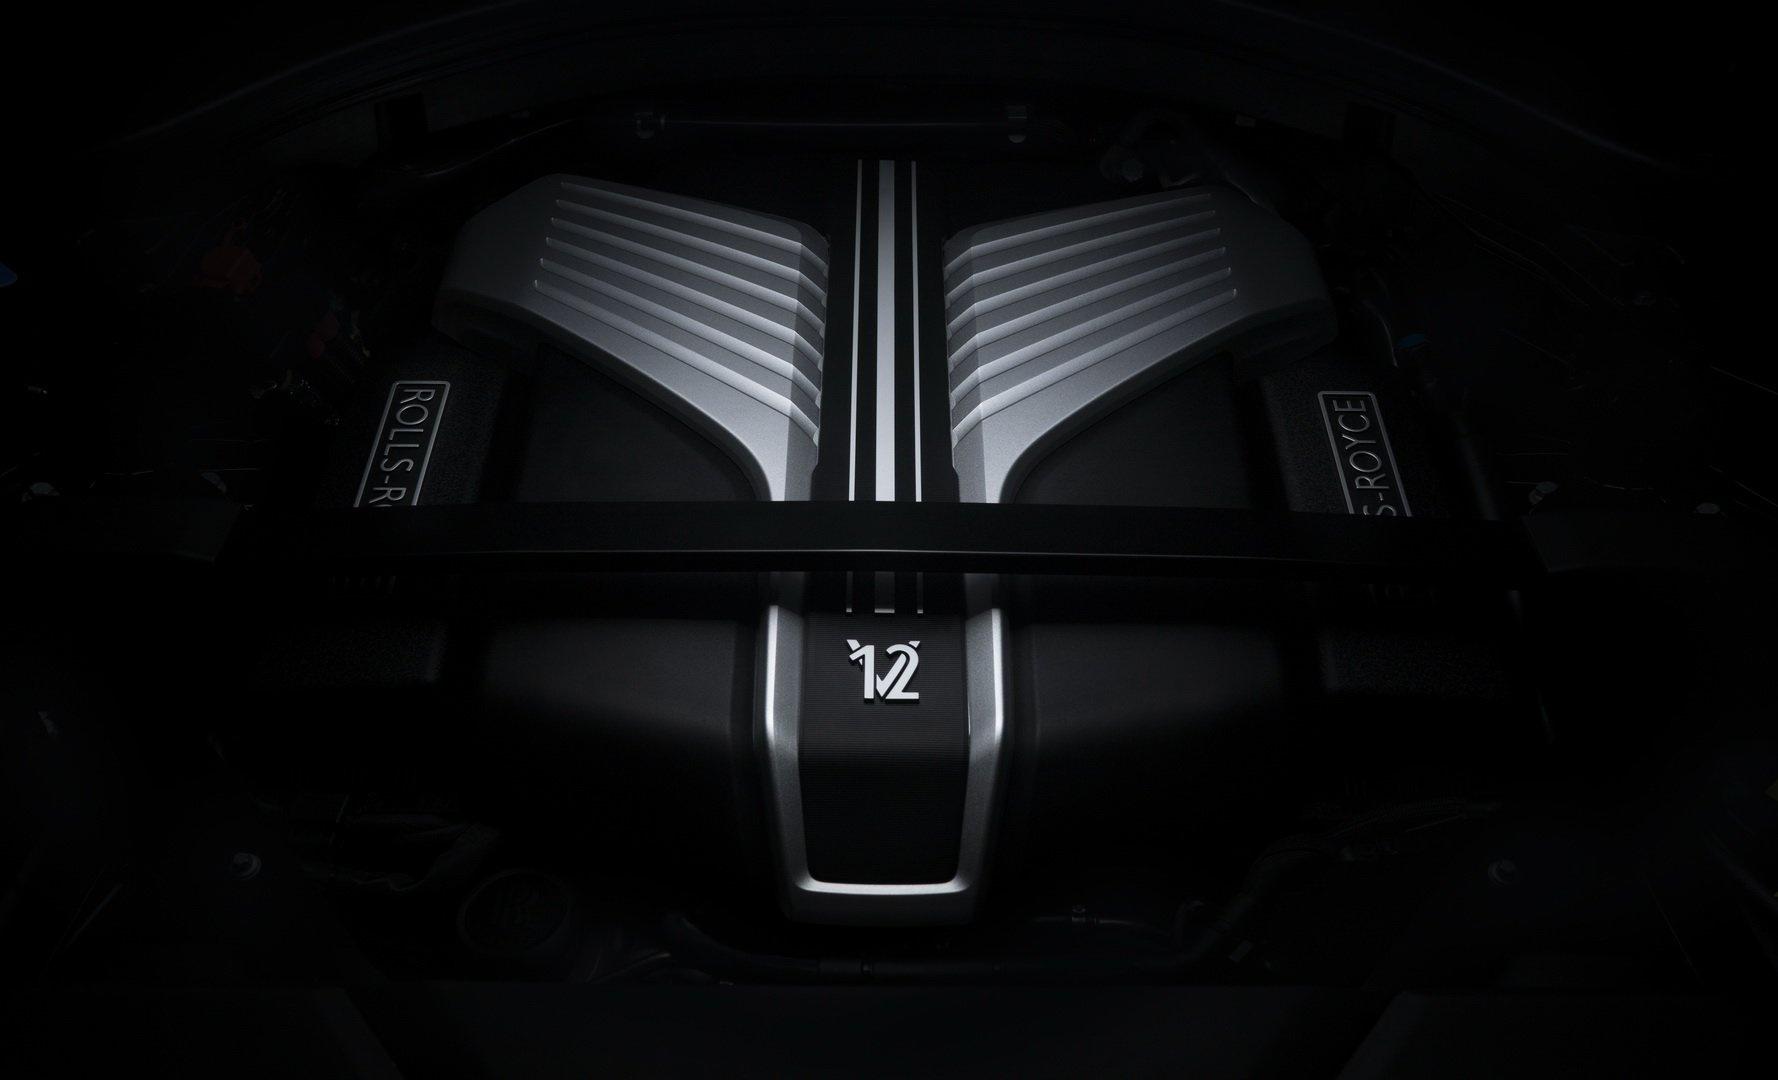 SUV sieu sang cua Rolls-Royce ban dac biet Black Badge ra mat hinh anh 20